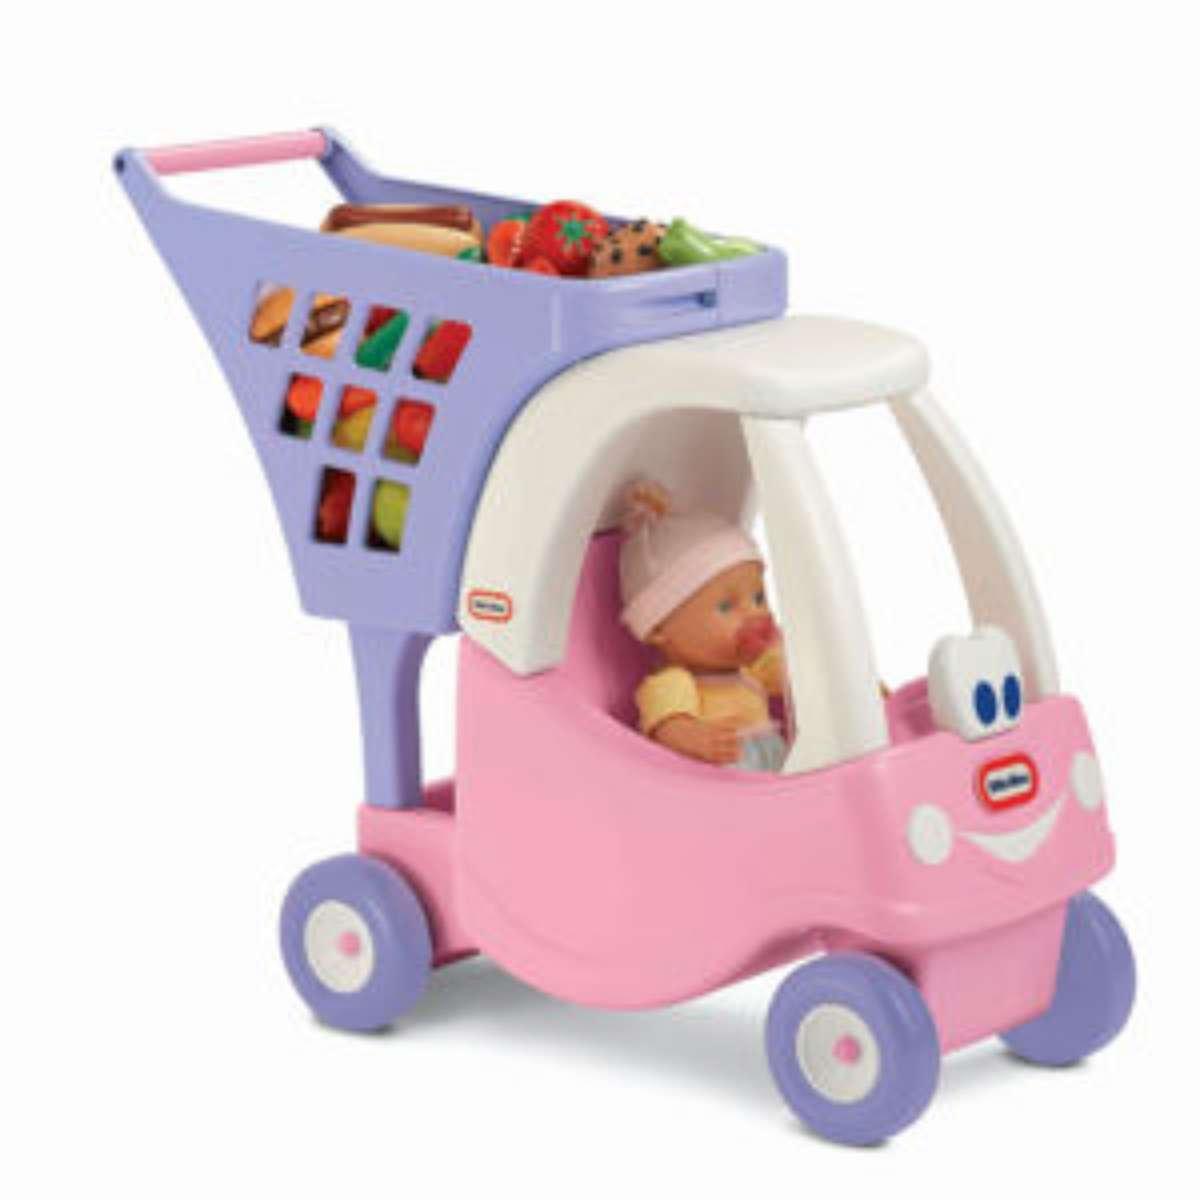 Little Tikes Cozy Shopping Cart Pink/Purple